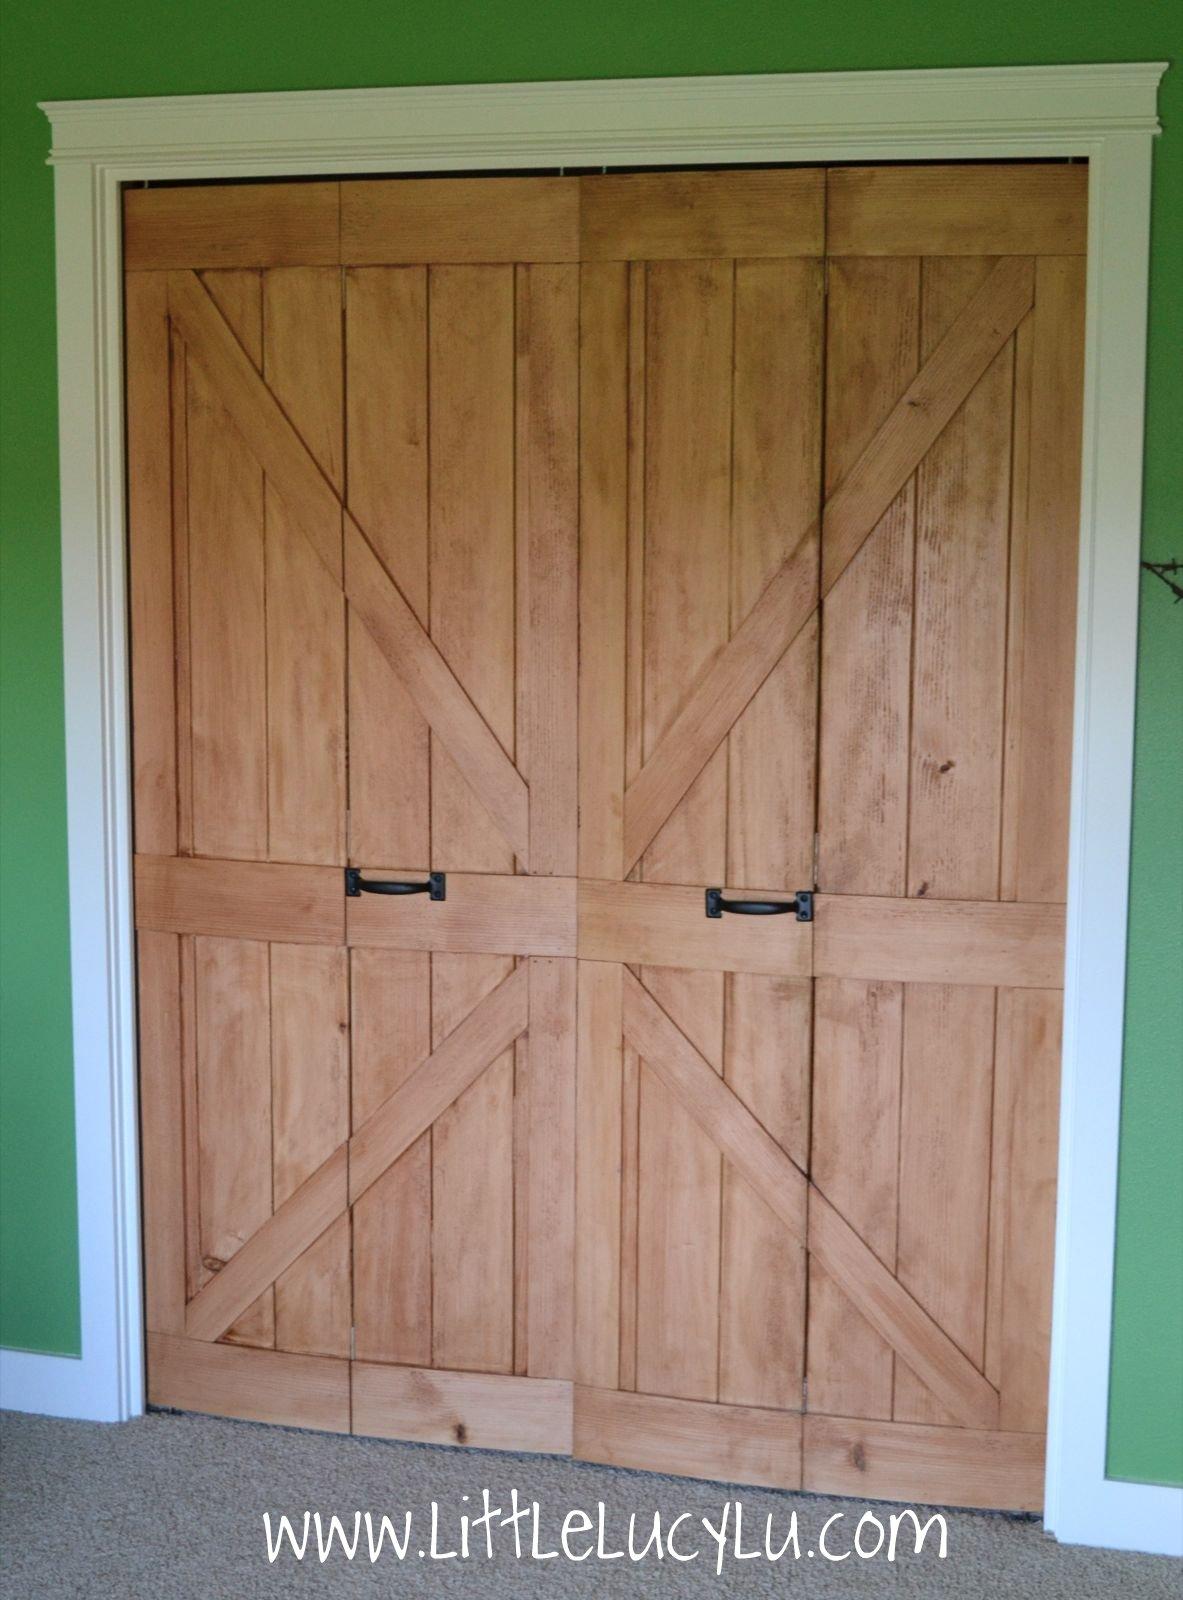 Little Lucy Lu: From Bi Fold To Barn Doors   Maxu0027s Closet!